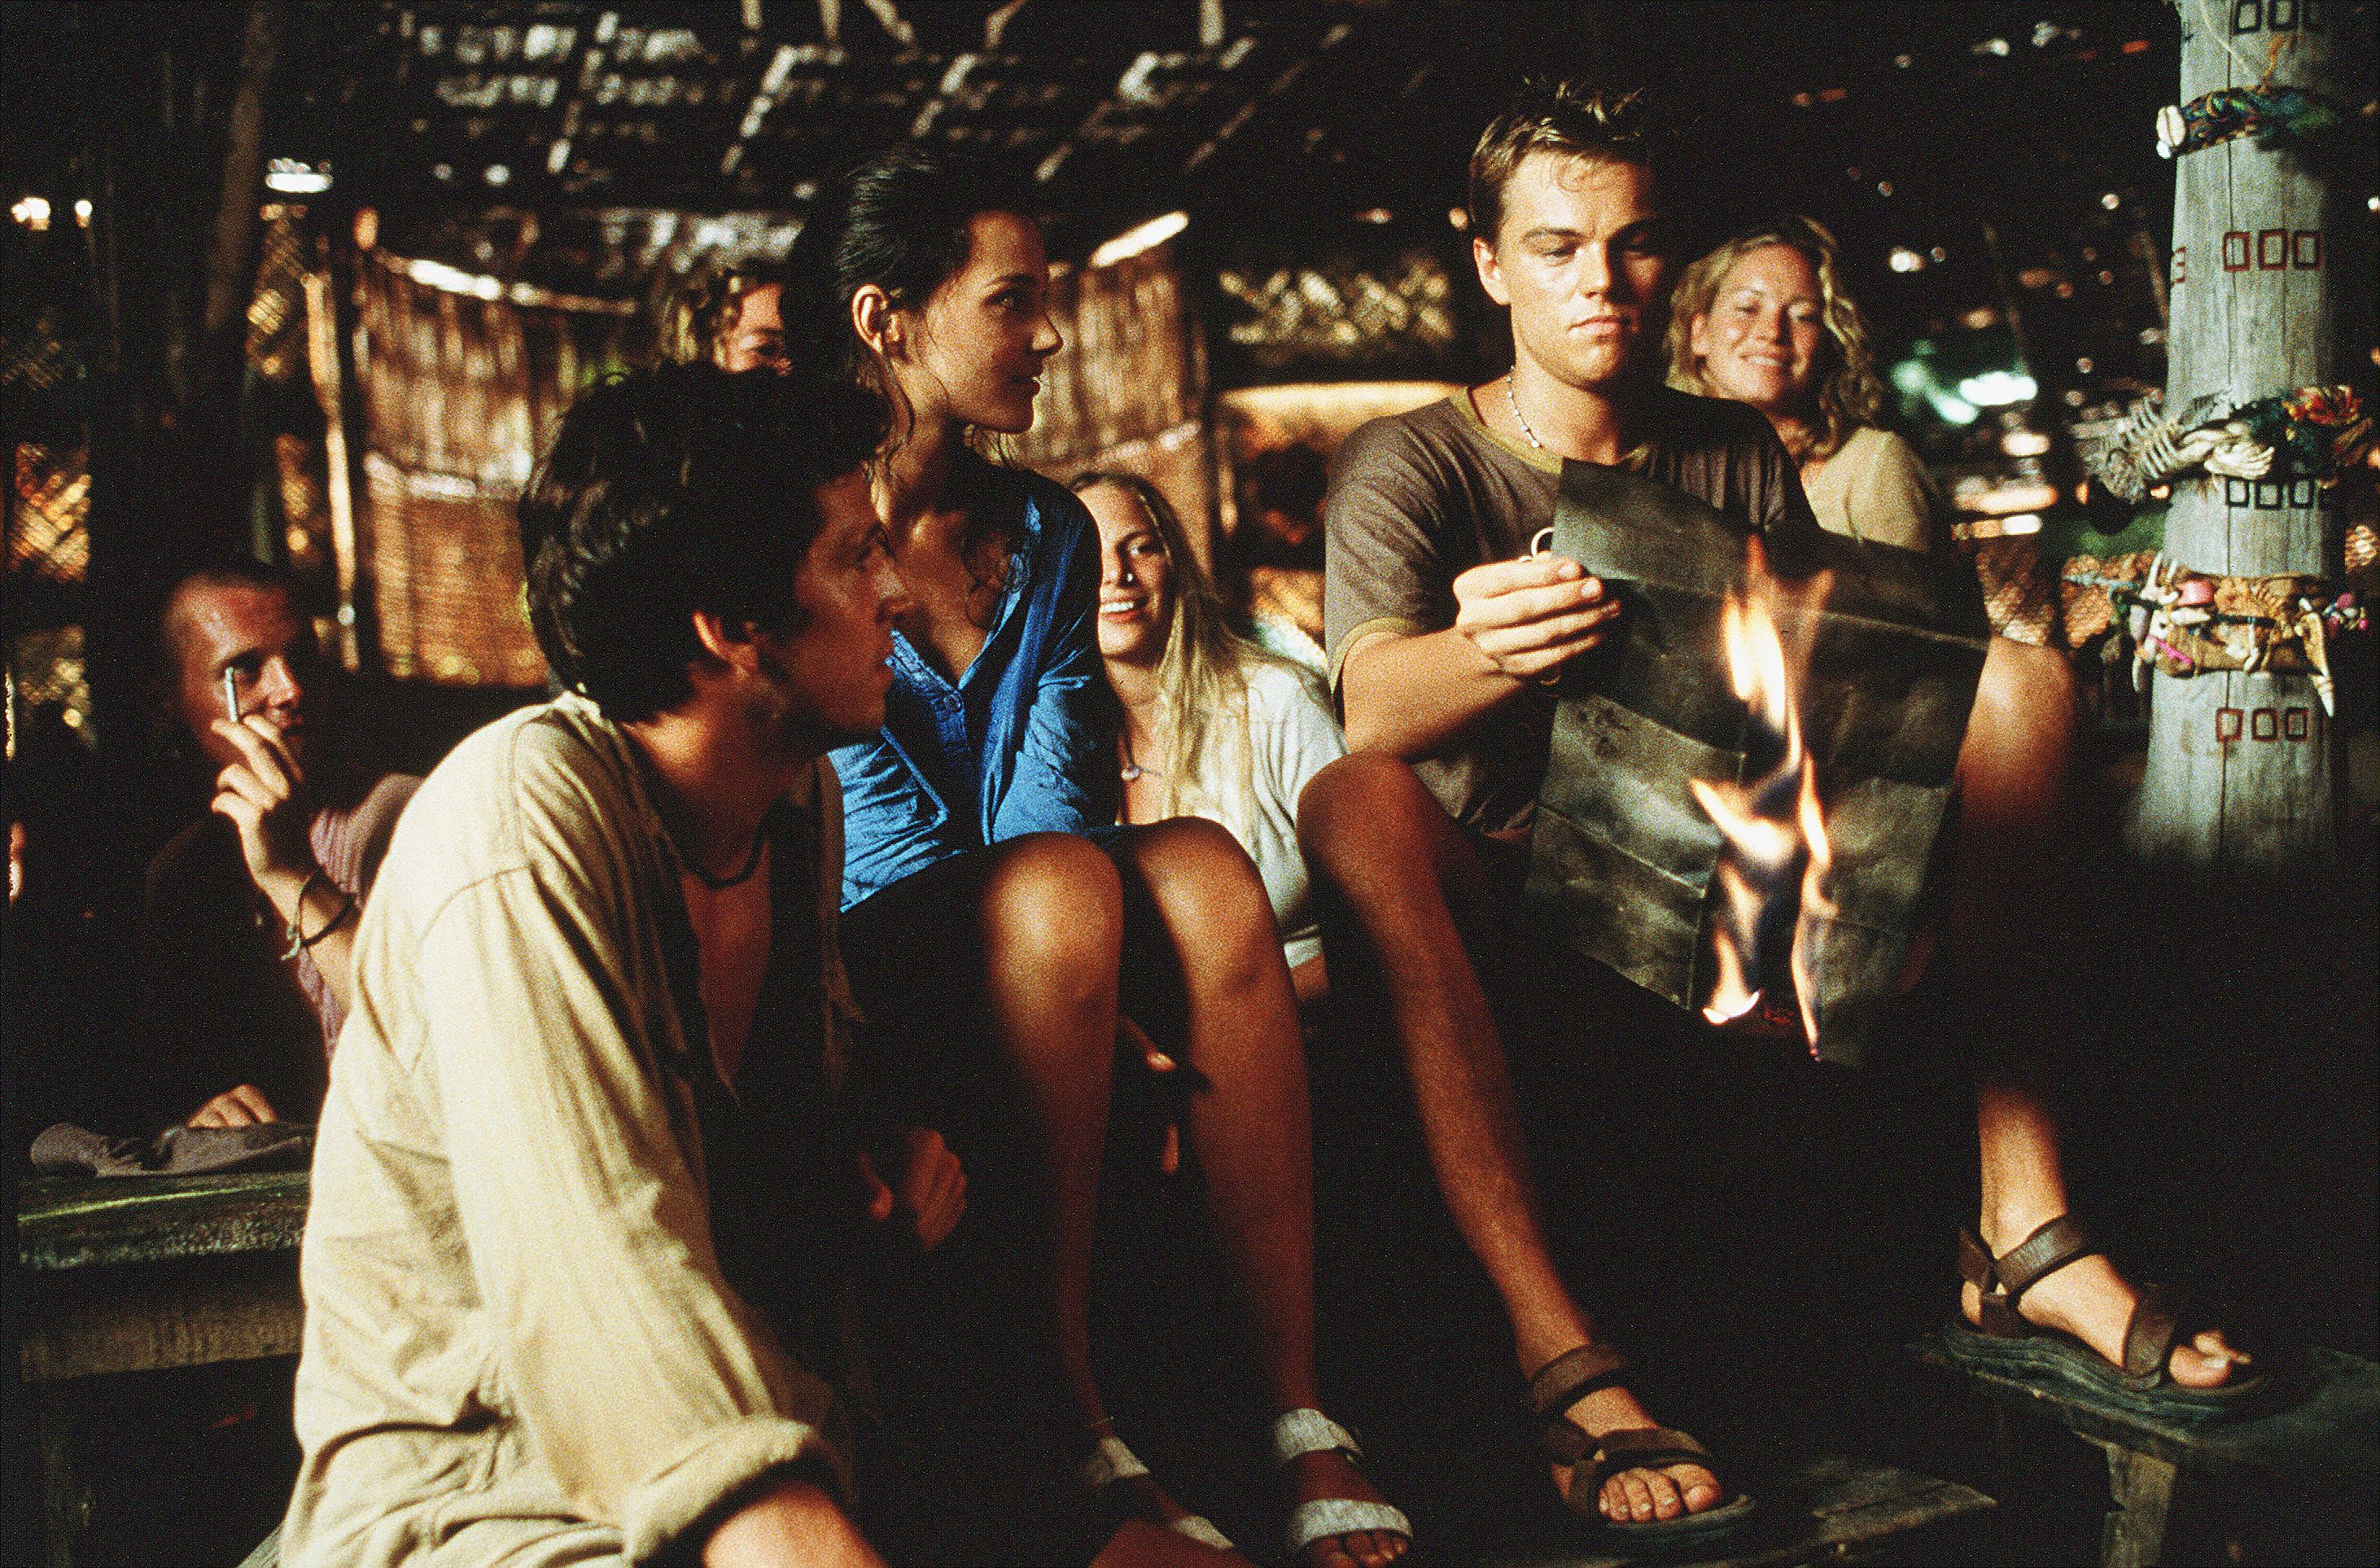 'The Beach' Prequel TV Series From Amy Seimetz Will Be a 'Bit of a Headf**k'